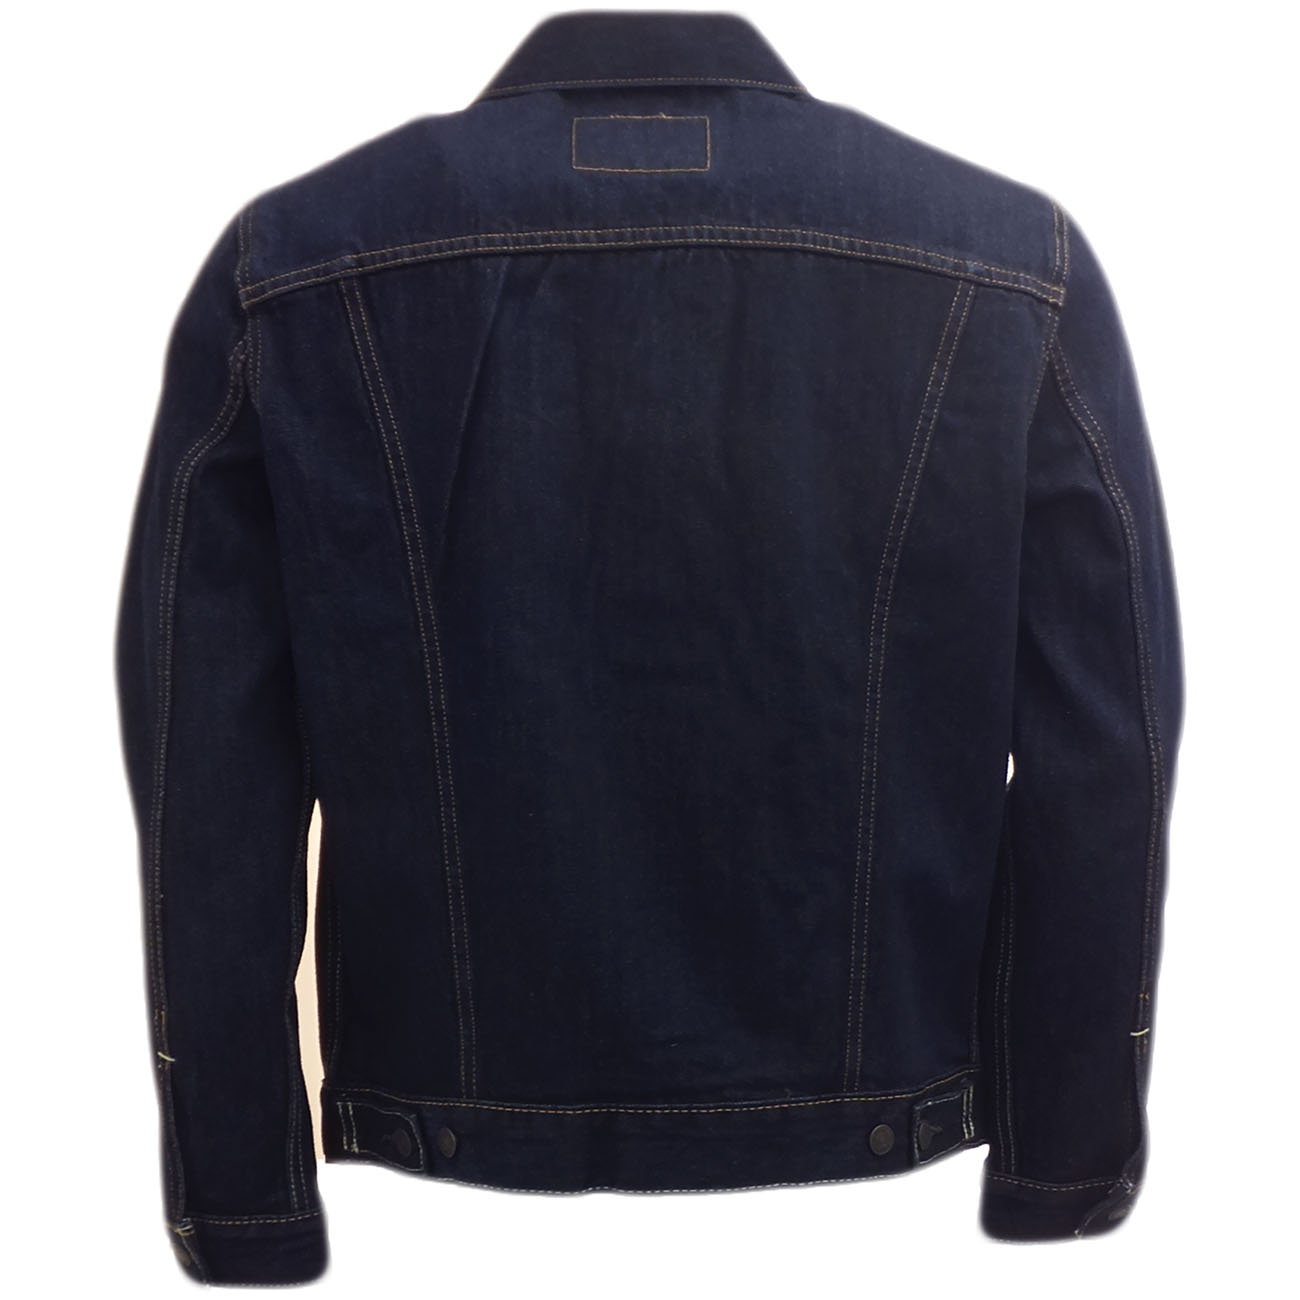 mens jean jacket levi strauss jeans mantel indigo. Black Bedroom Furniture Sets. Home Design Ideas